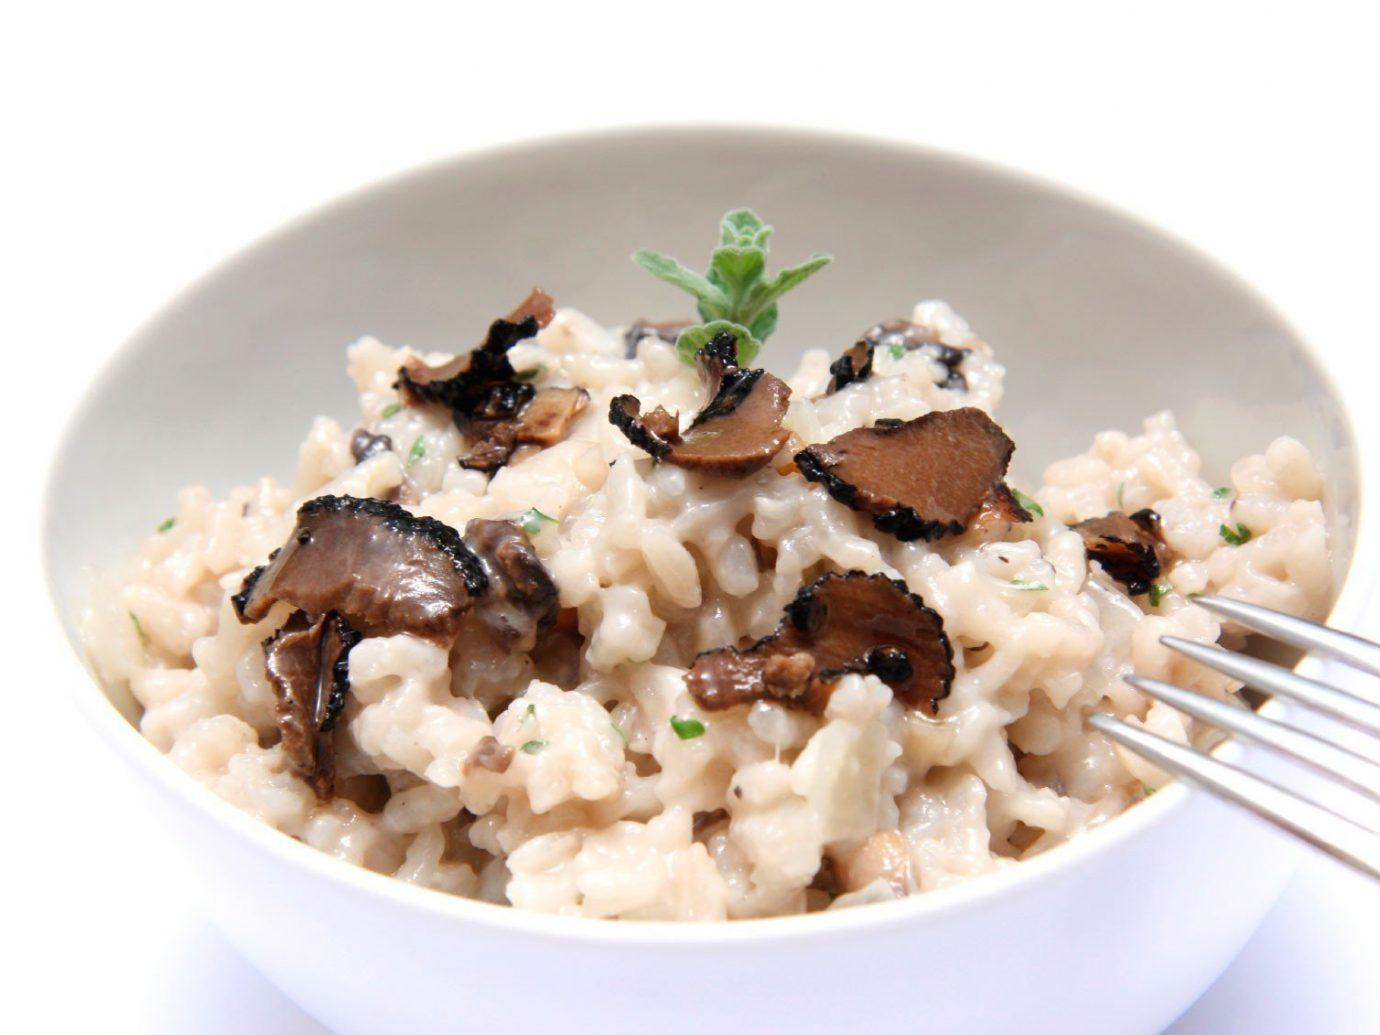 Food + Drink plate food dish white cuisine italian food risotto produce meal breakfast european food vegetarian food meat